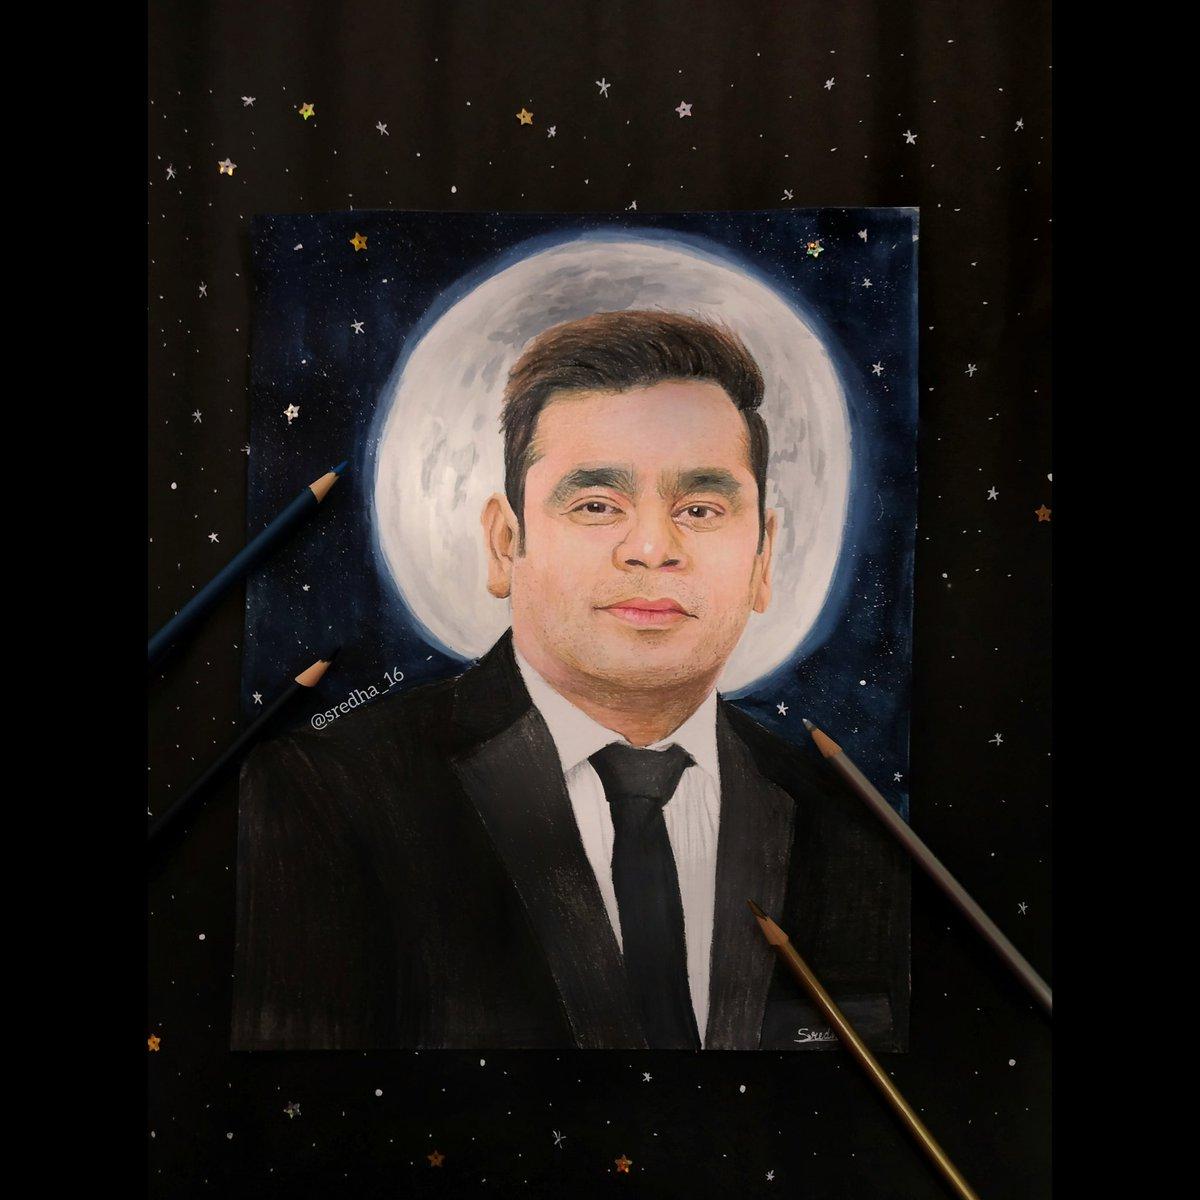 @arrahman @prasoonjoshi_ @AntaraNandy @harpic_india @CNNnews18 Master magician of music 🎶🌟💫 @arrahman Hope you like it sir🙏🏻✨ #fanart